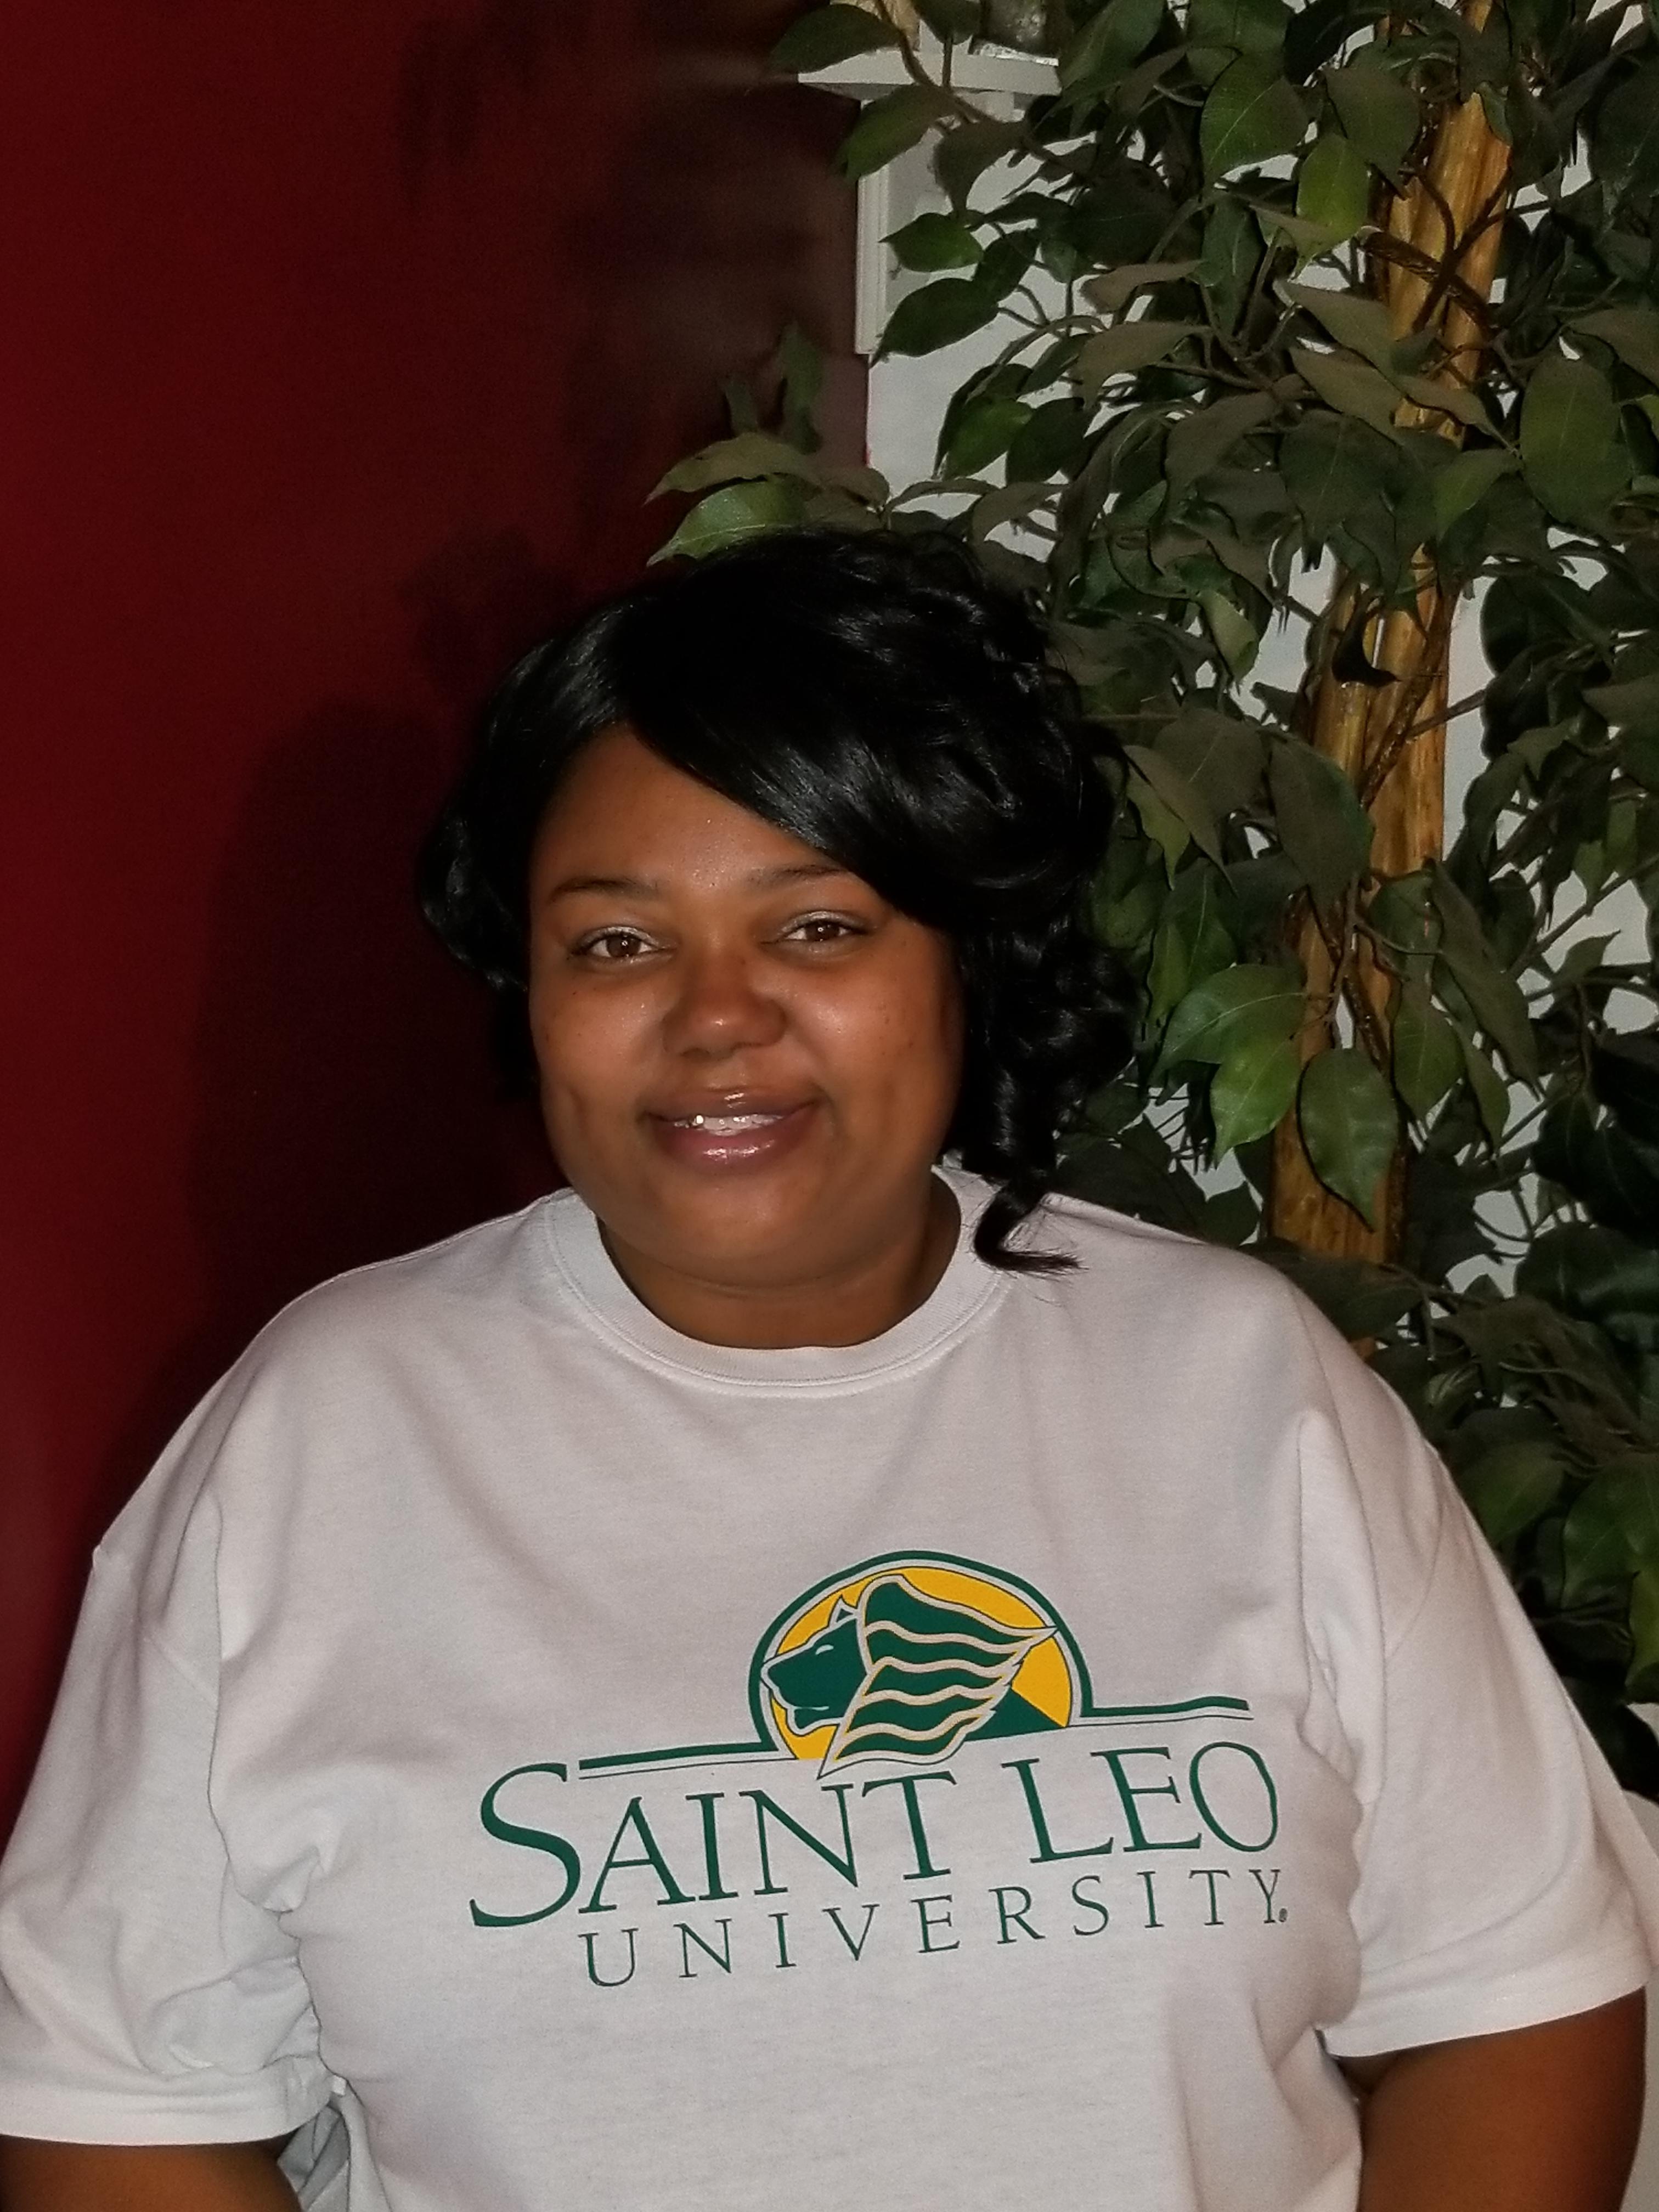 Saint Leo University student McKisha Jones